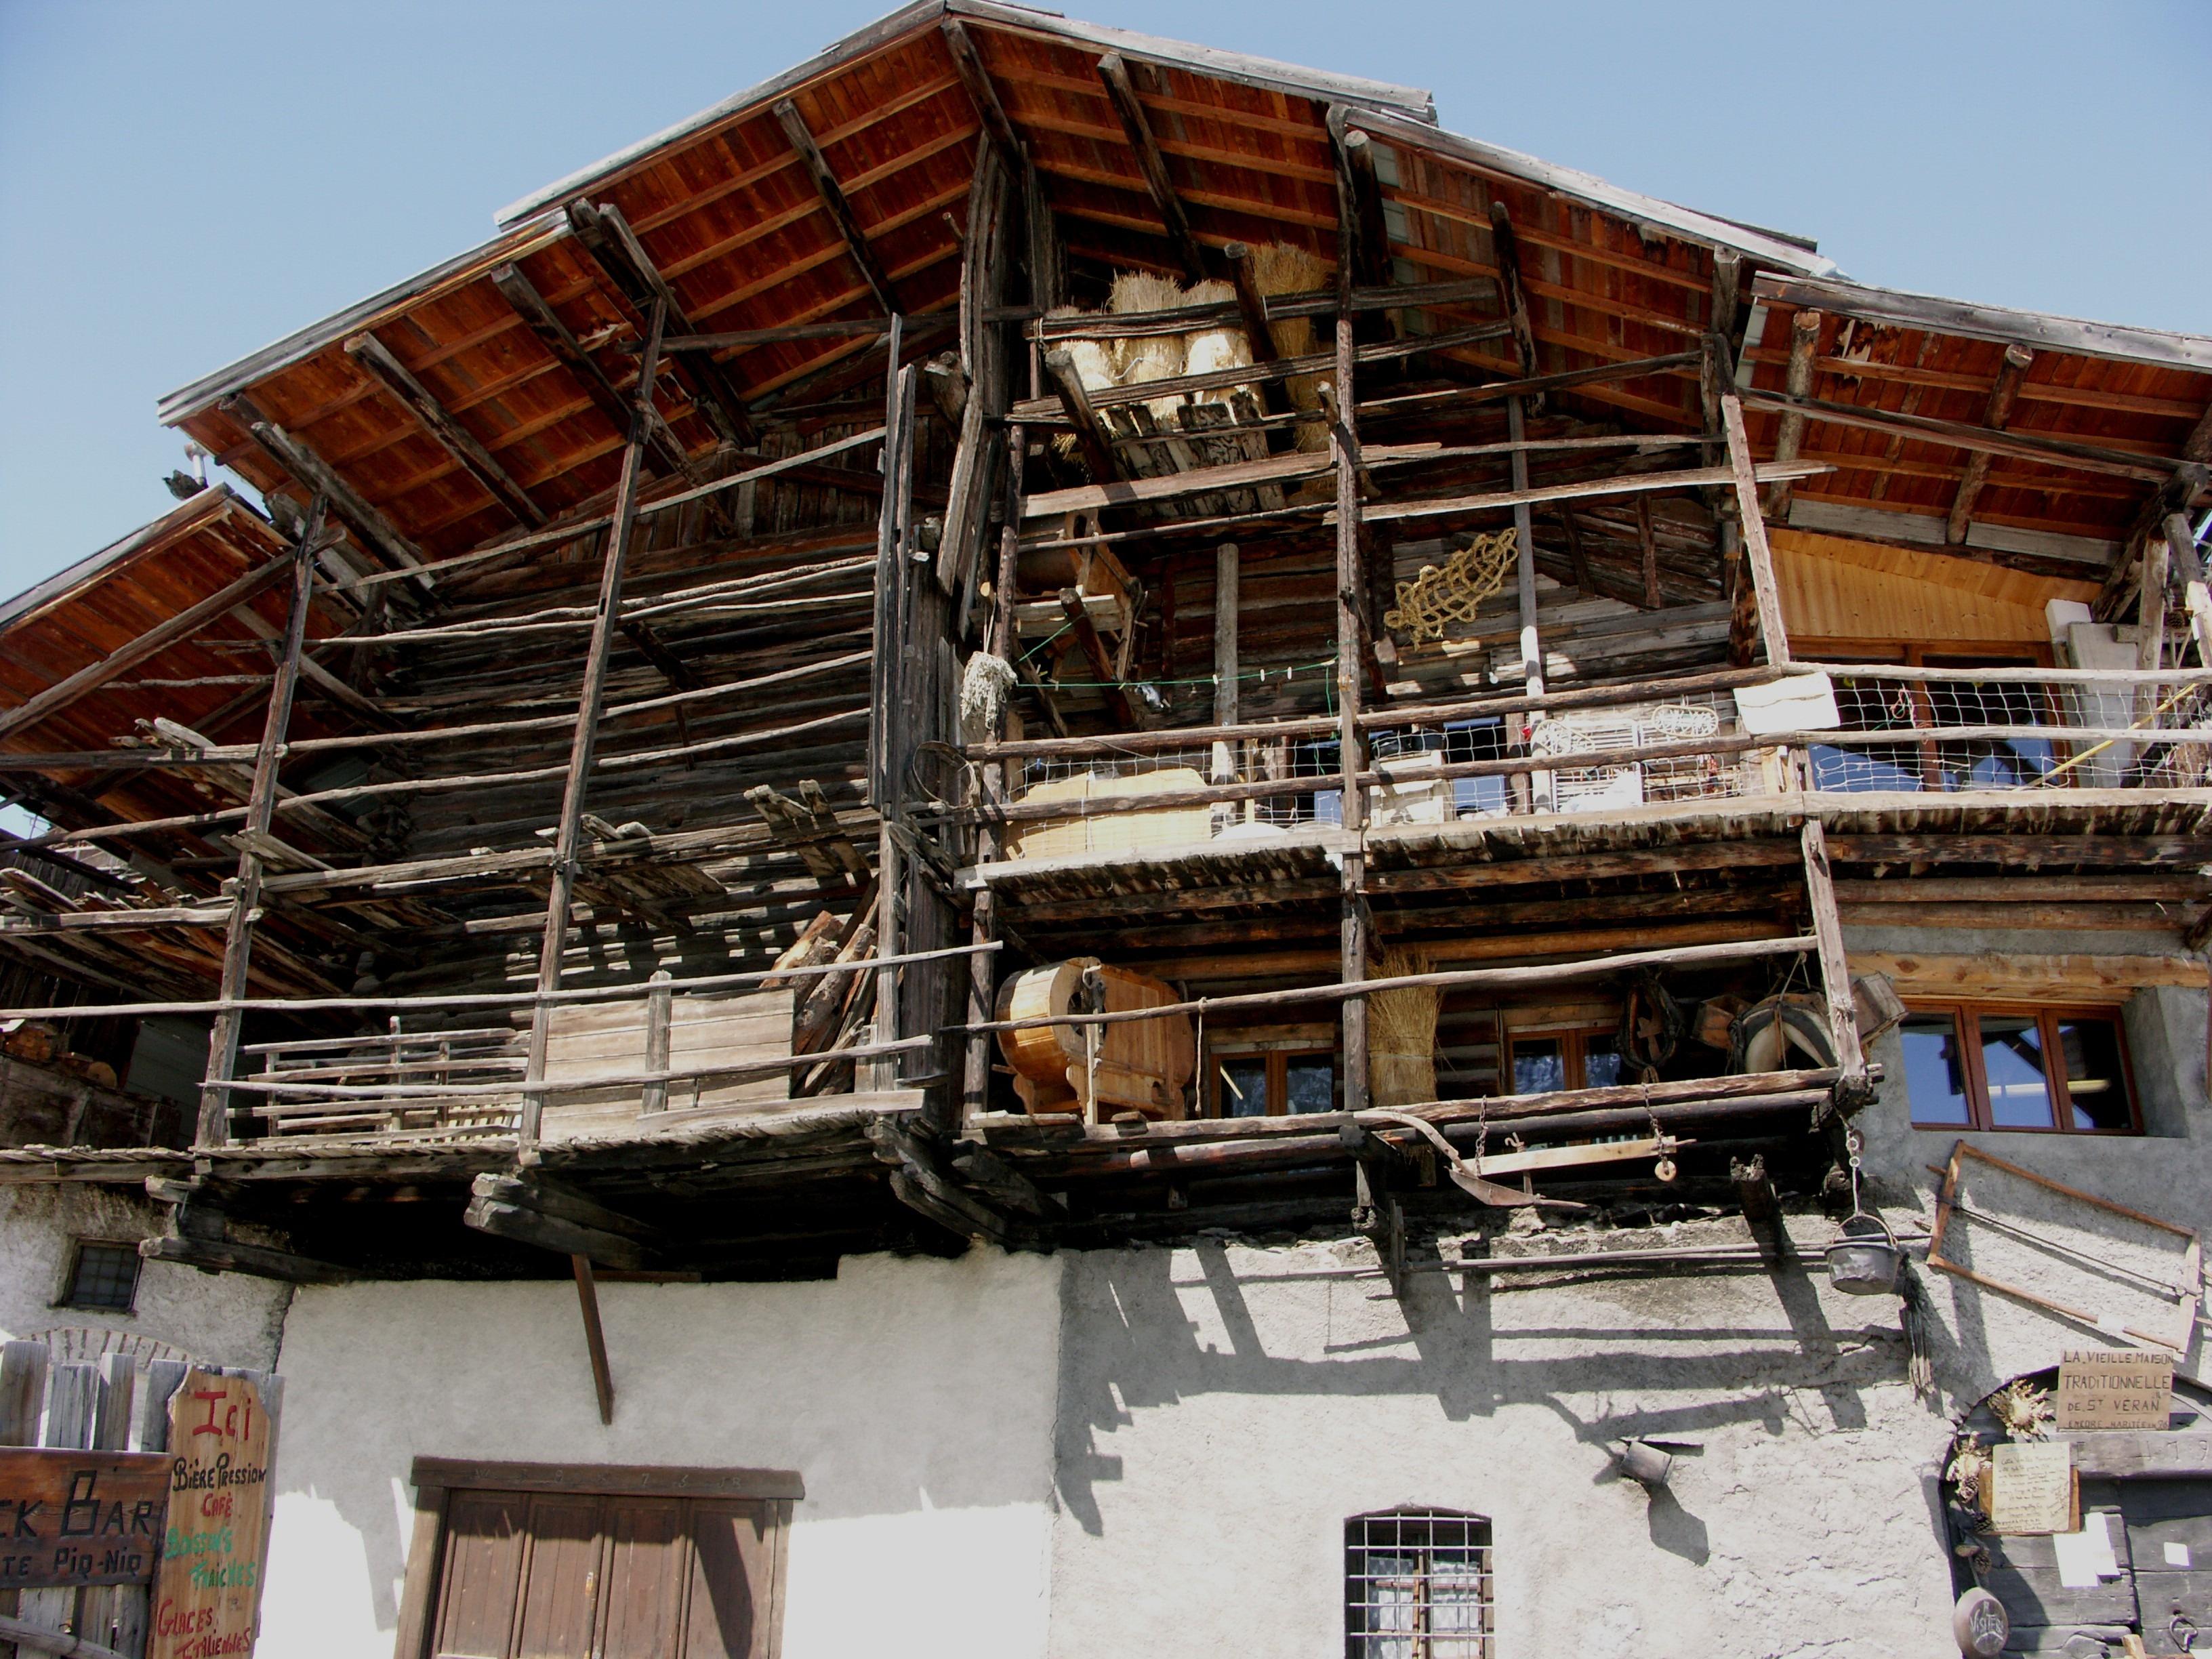 Fotos gratis : montaña, estructura, madera, techo, rústico ...